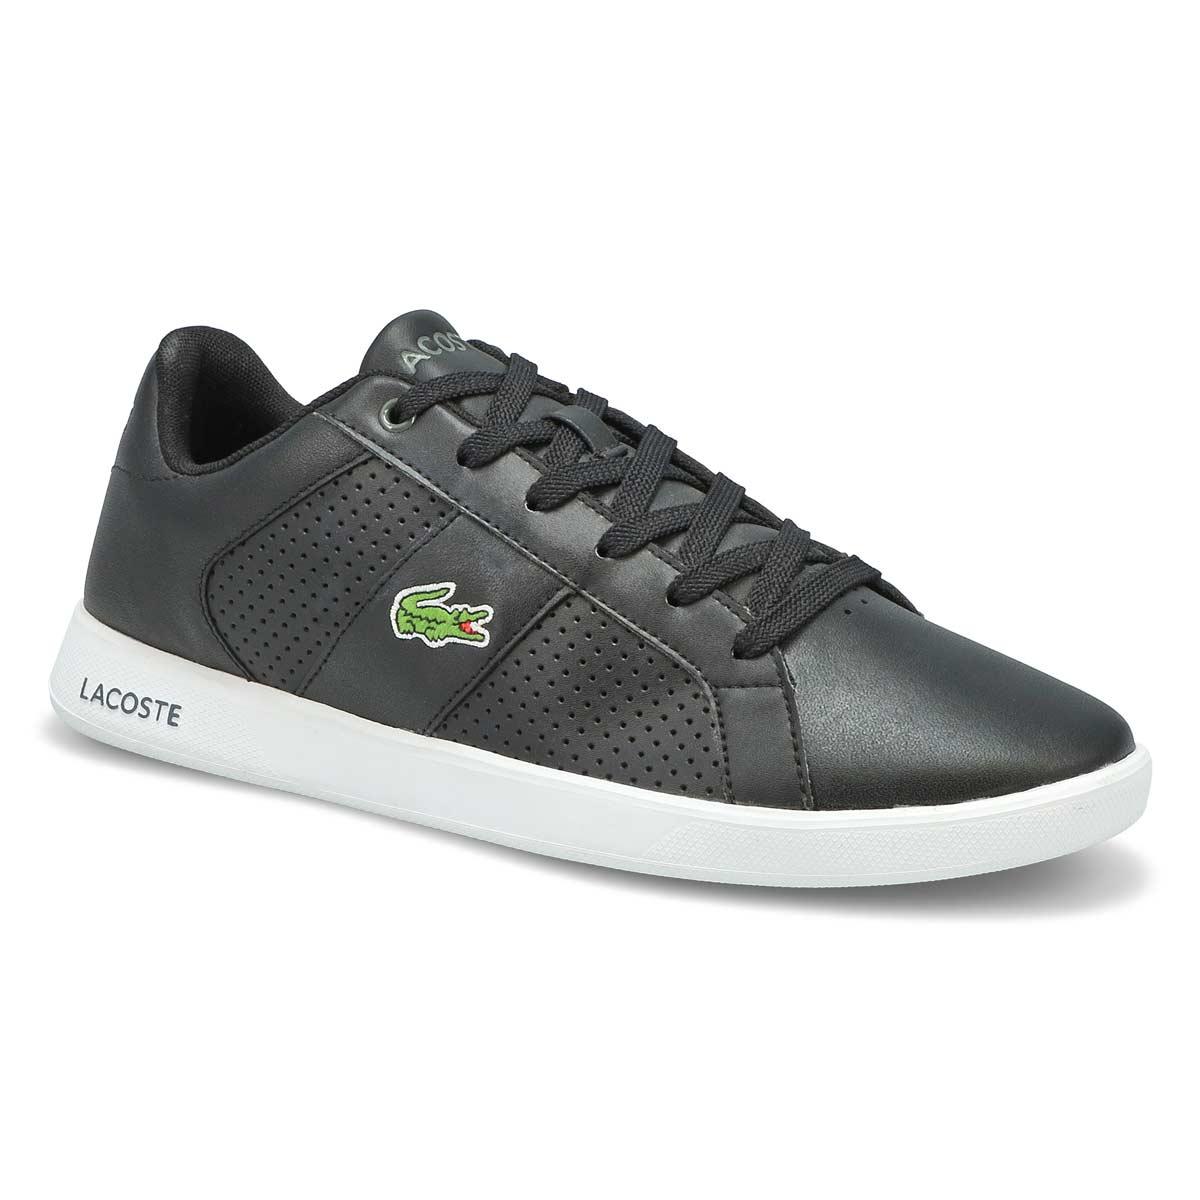 Men's Novas 120 1P SMA Sneaker - Black/White